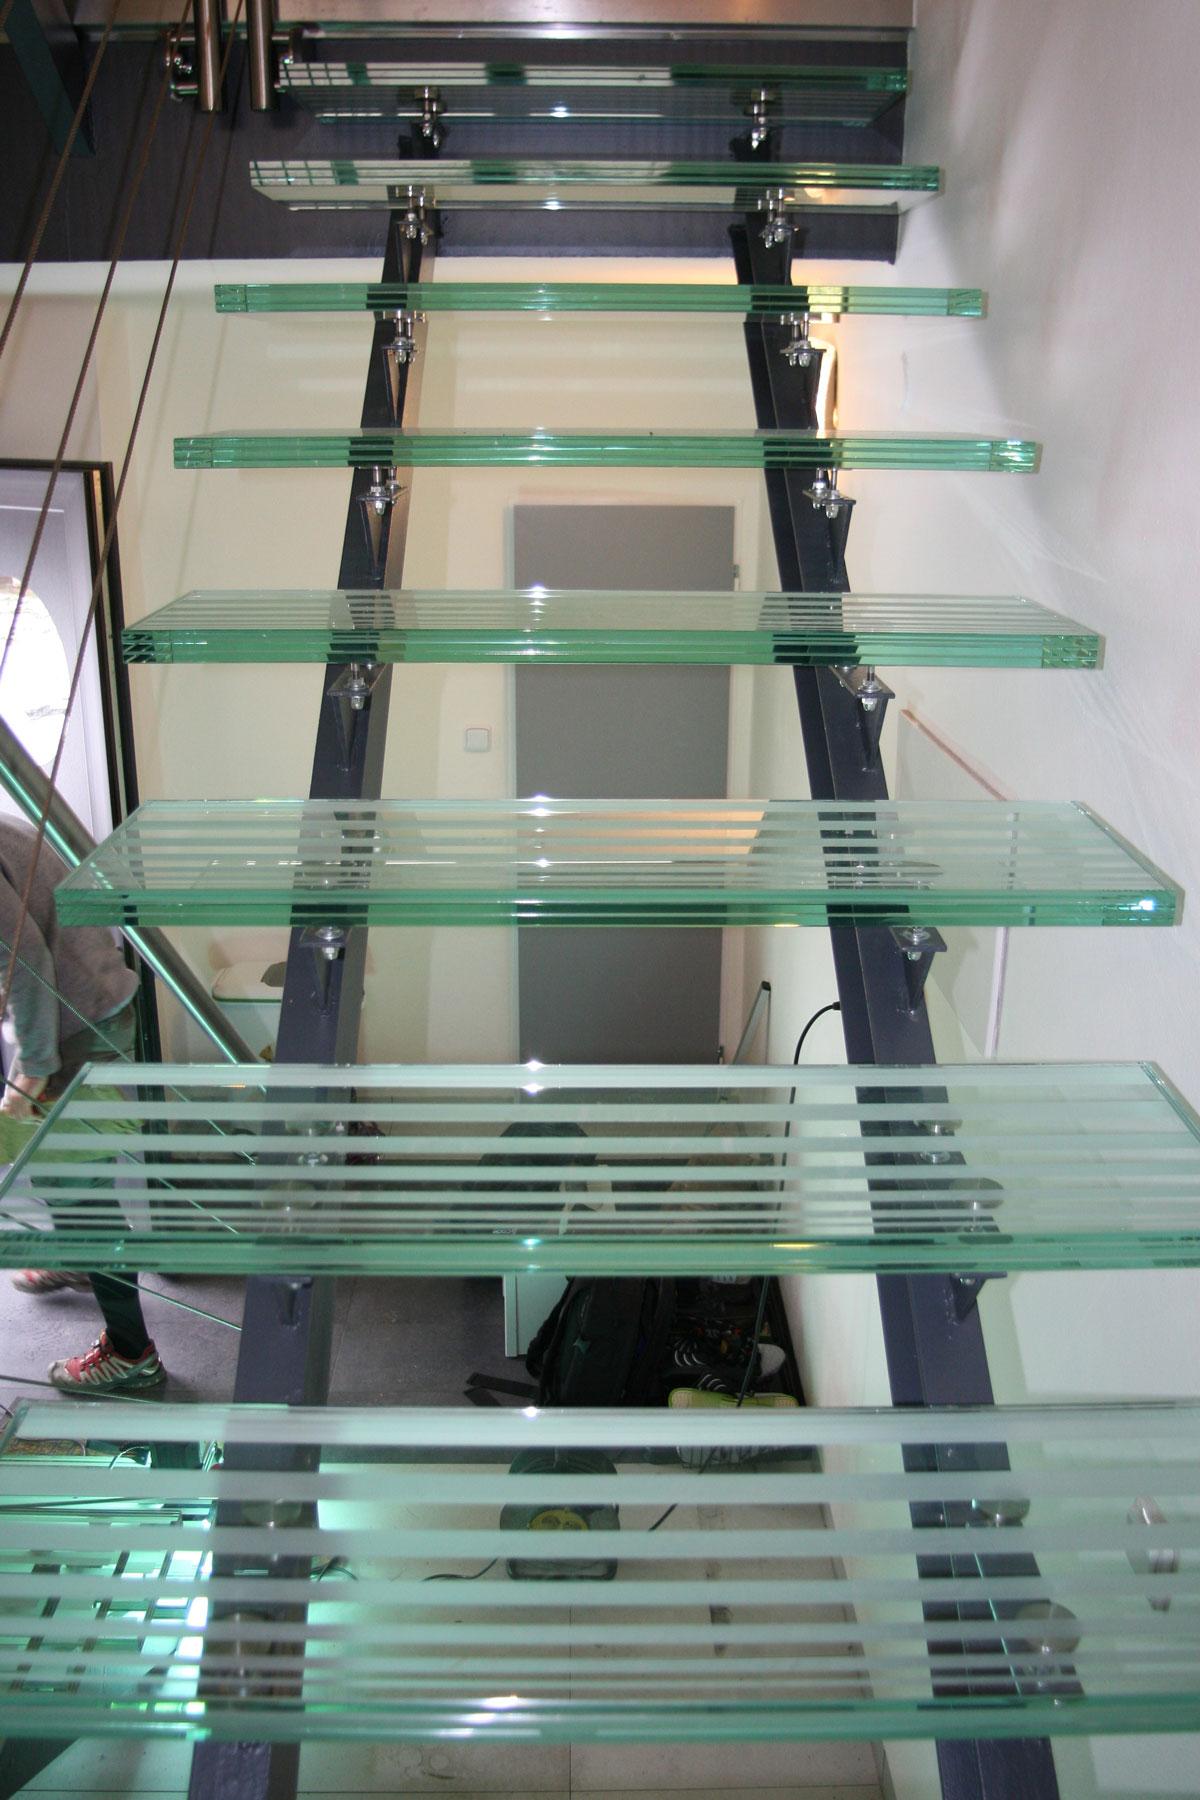 Sklenarstvi-Prerost-schody-a- pochozi-sklo (21)